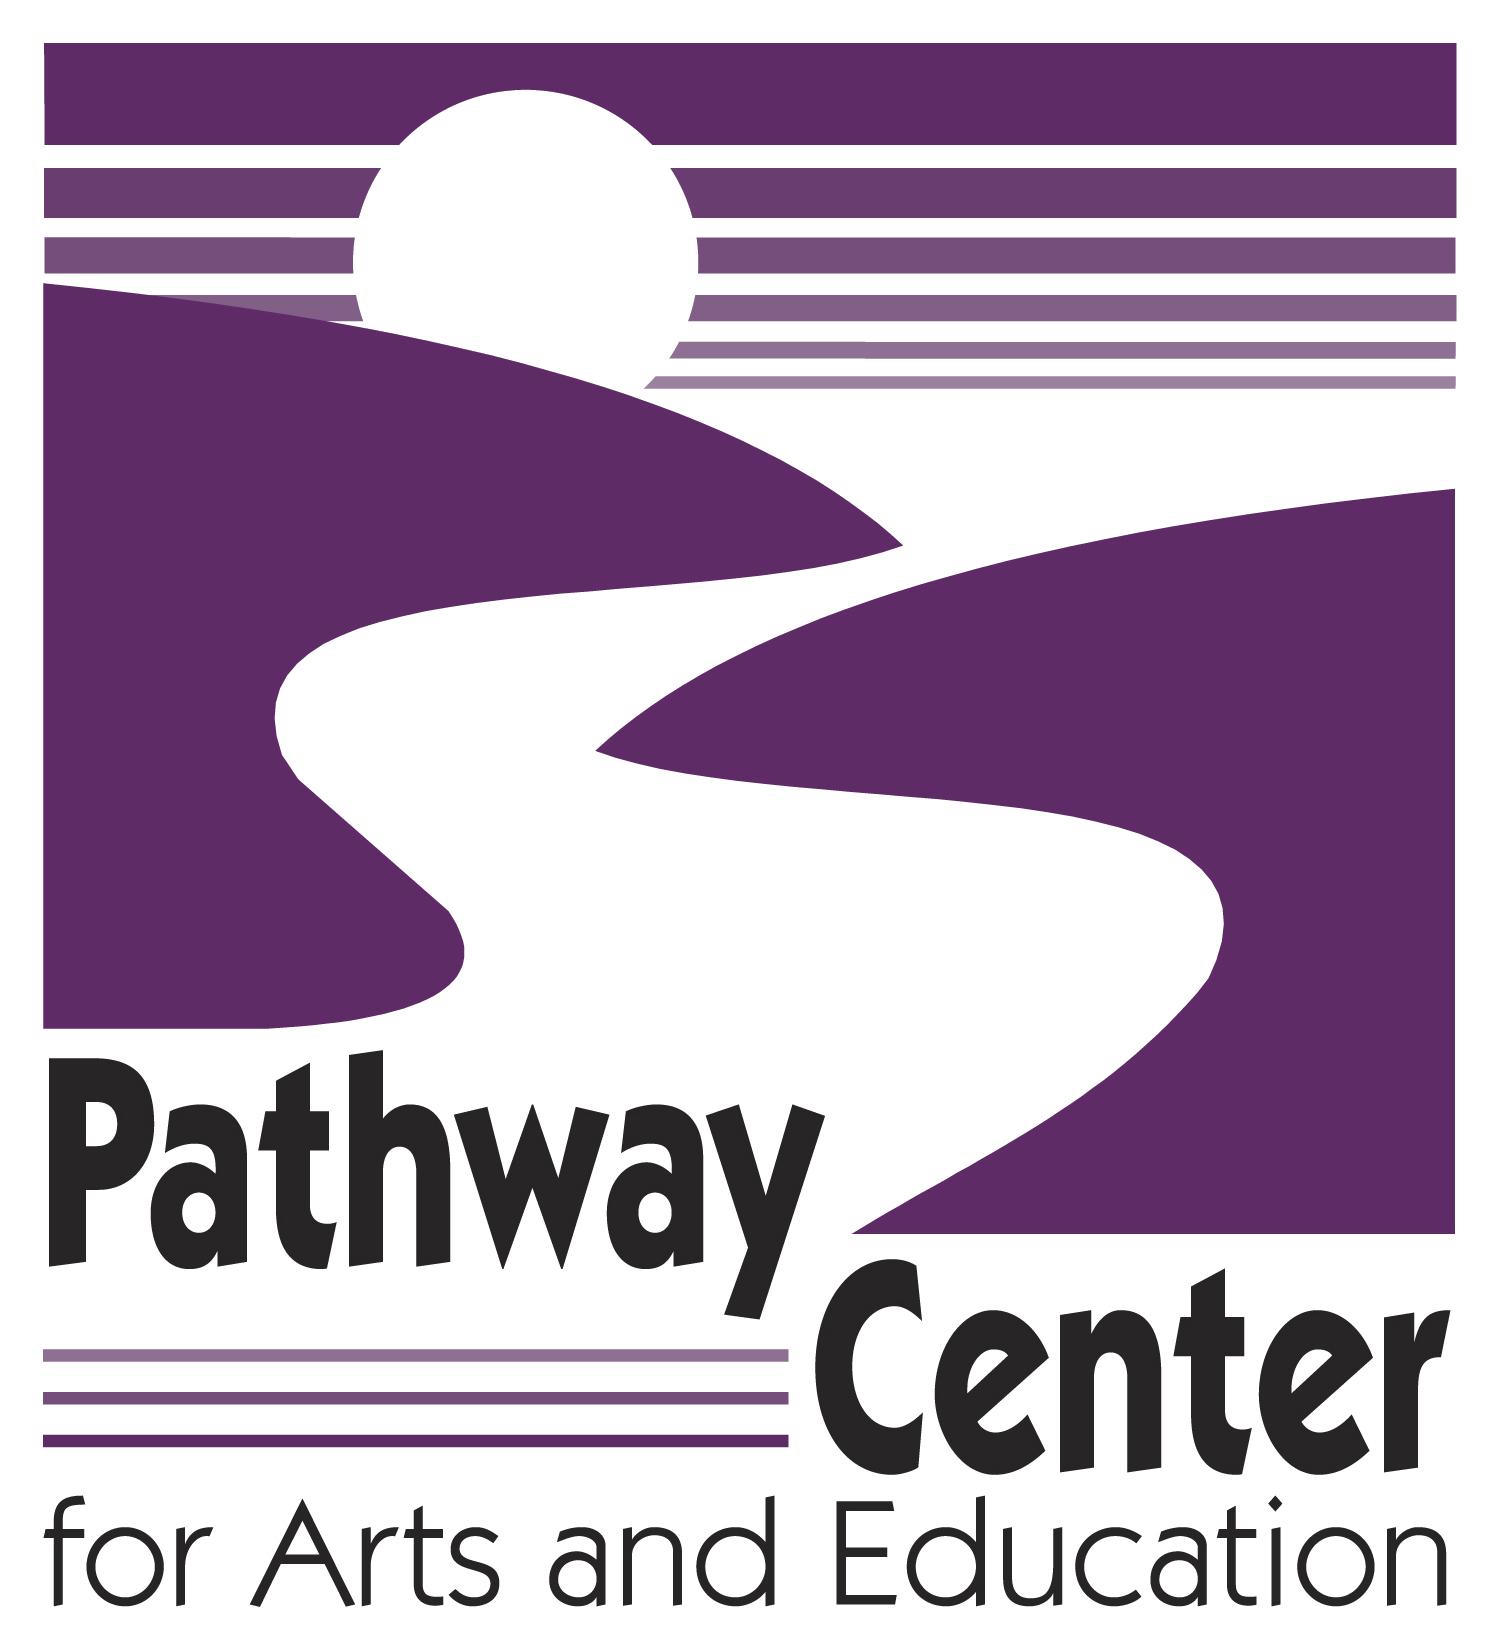 Pathway Center